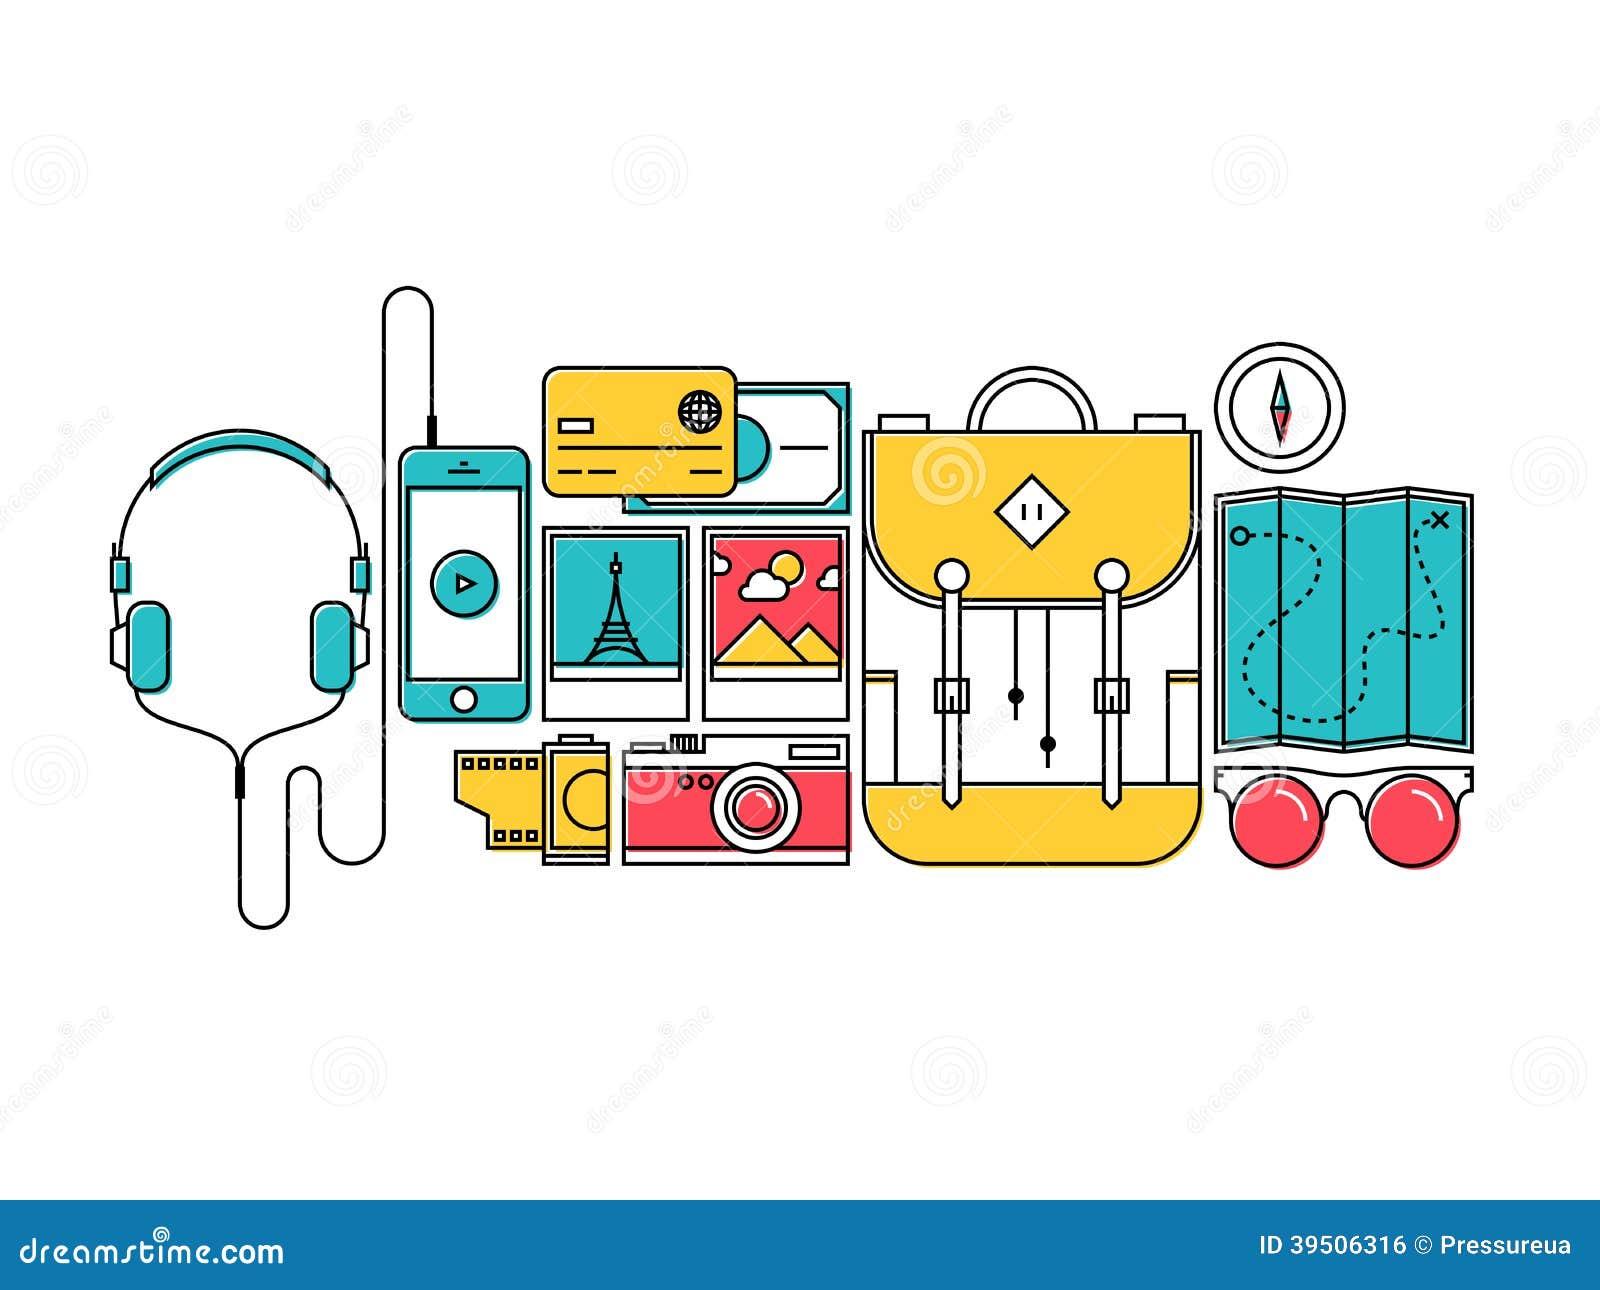 Traveler items for city trip flat line concept